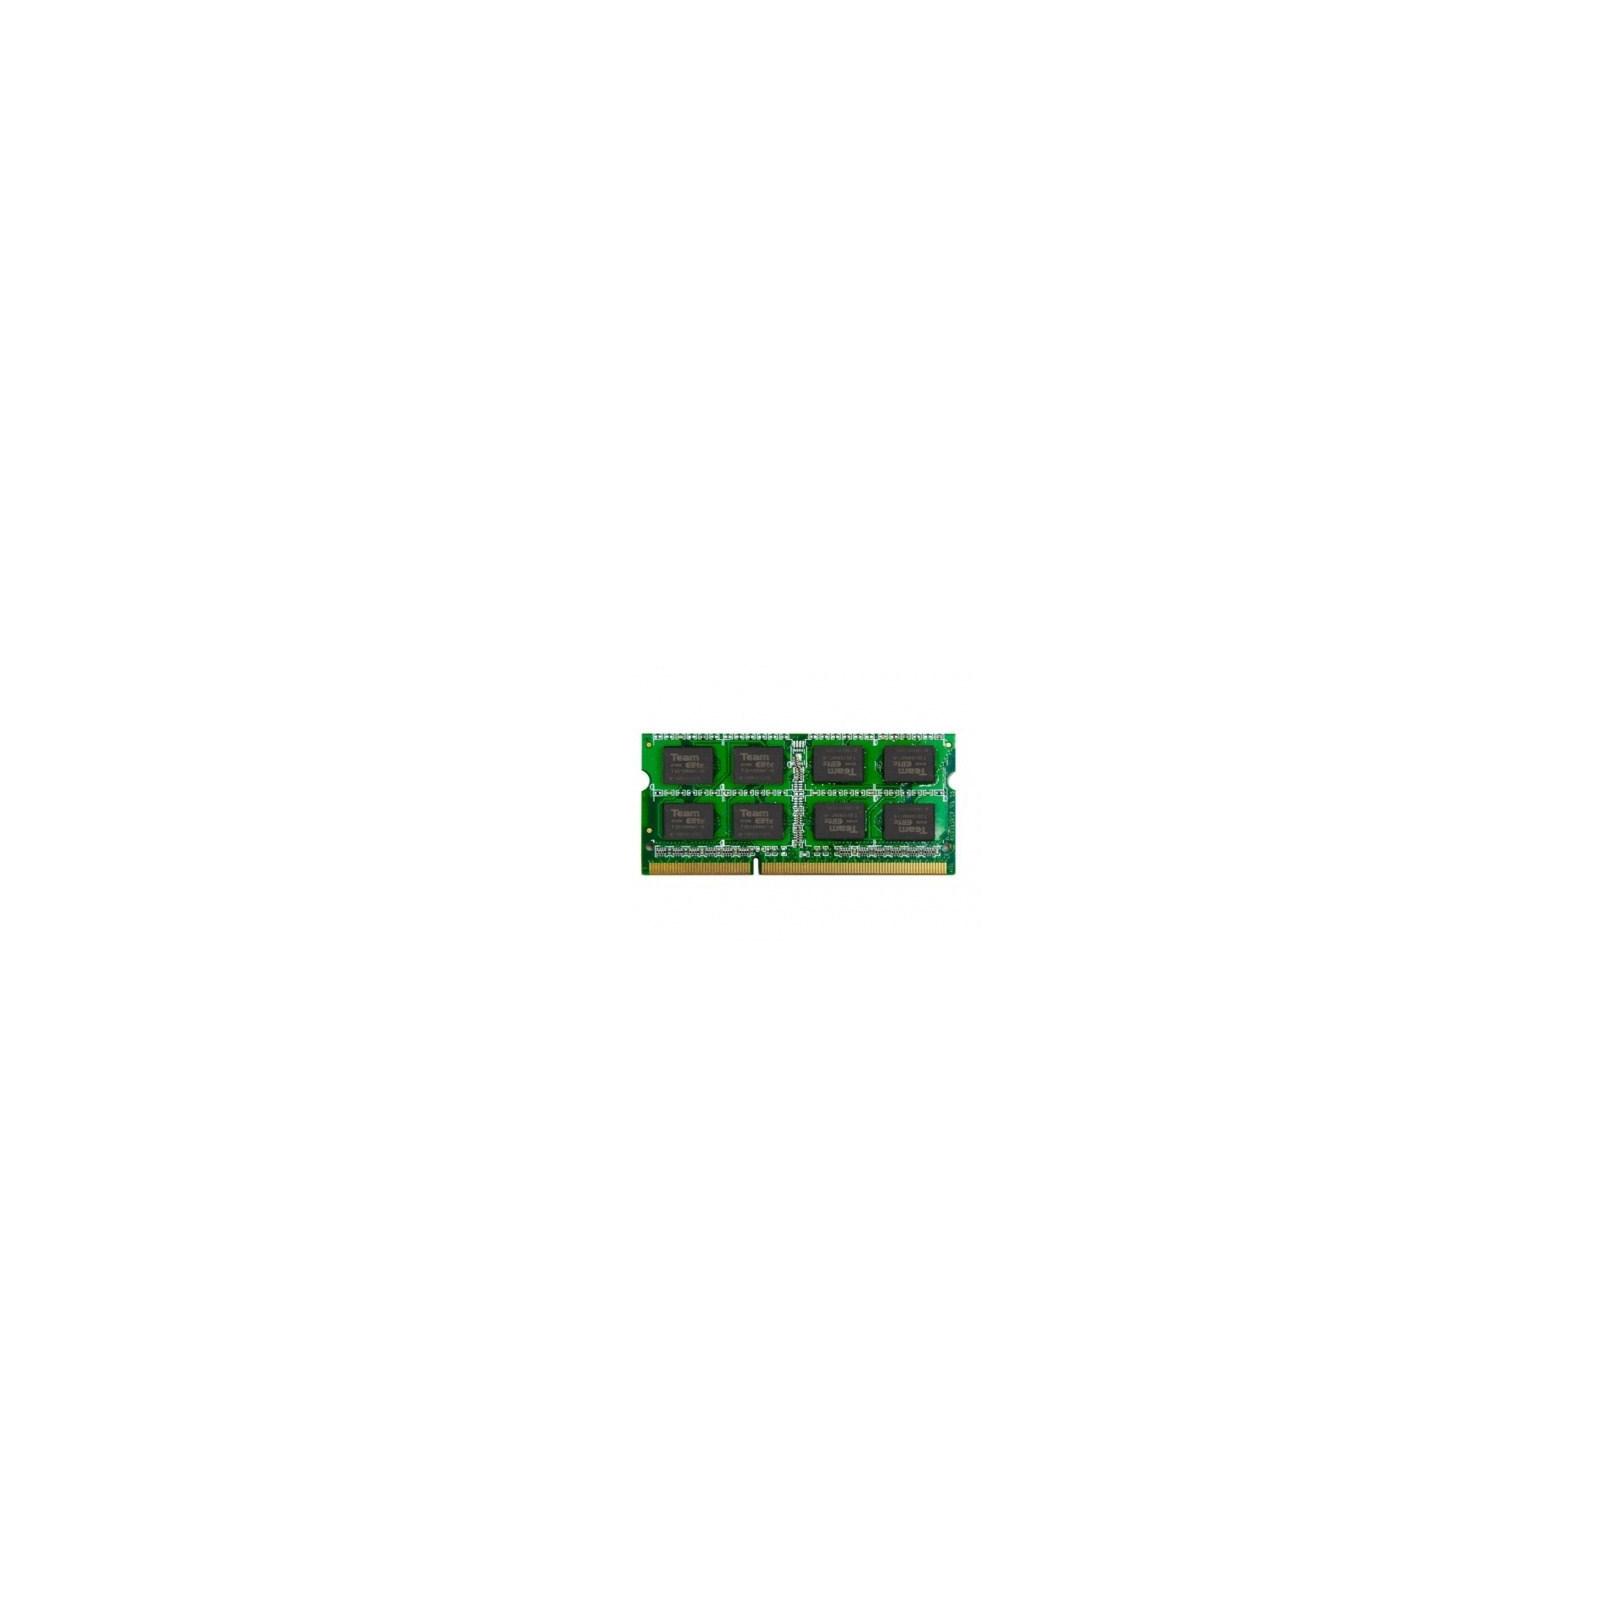 Модуль памяти для ноутбука SoDIMM DDR2 2GB 800 MHz Team (TED22G800C5-S01)